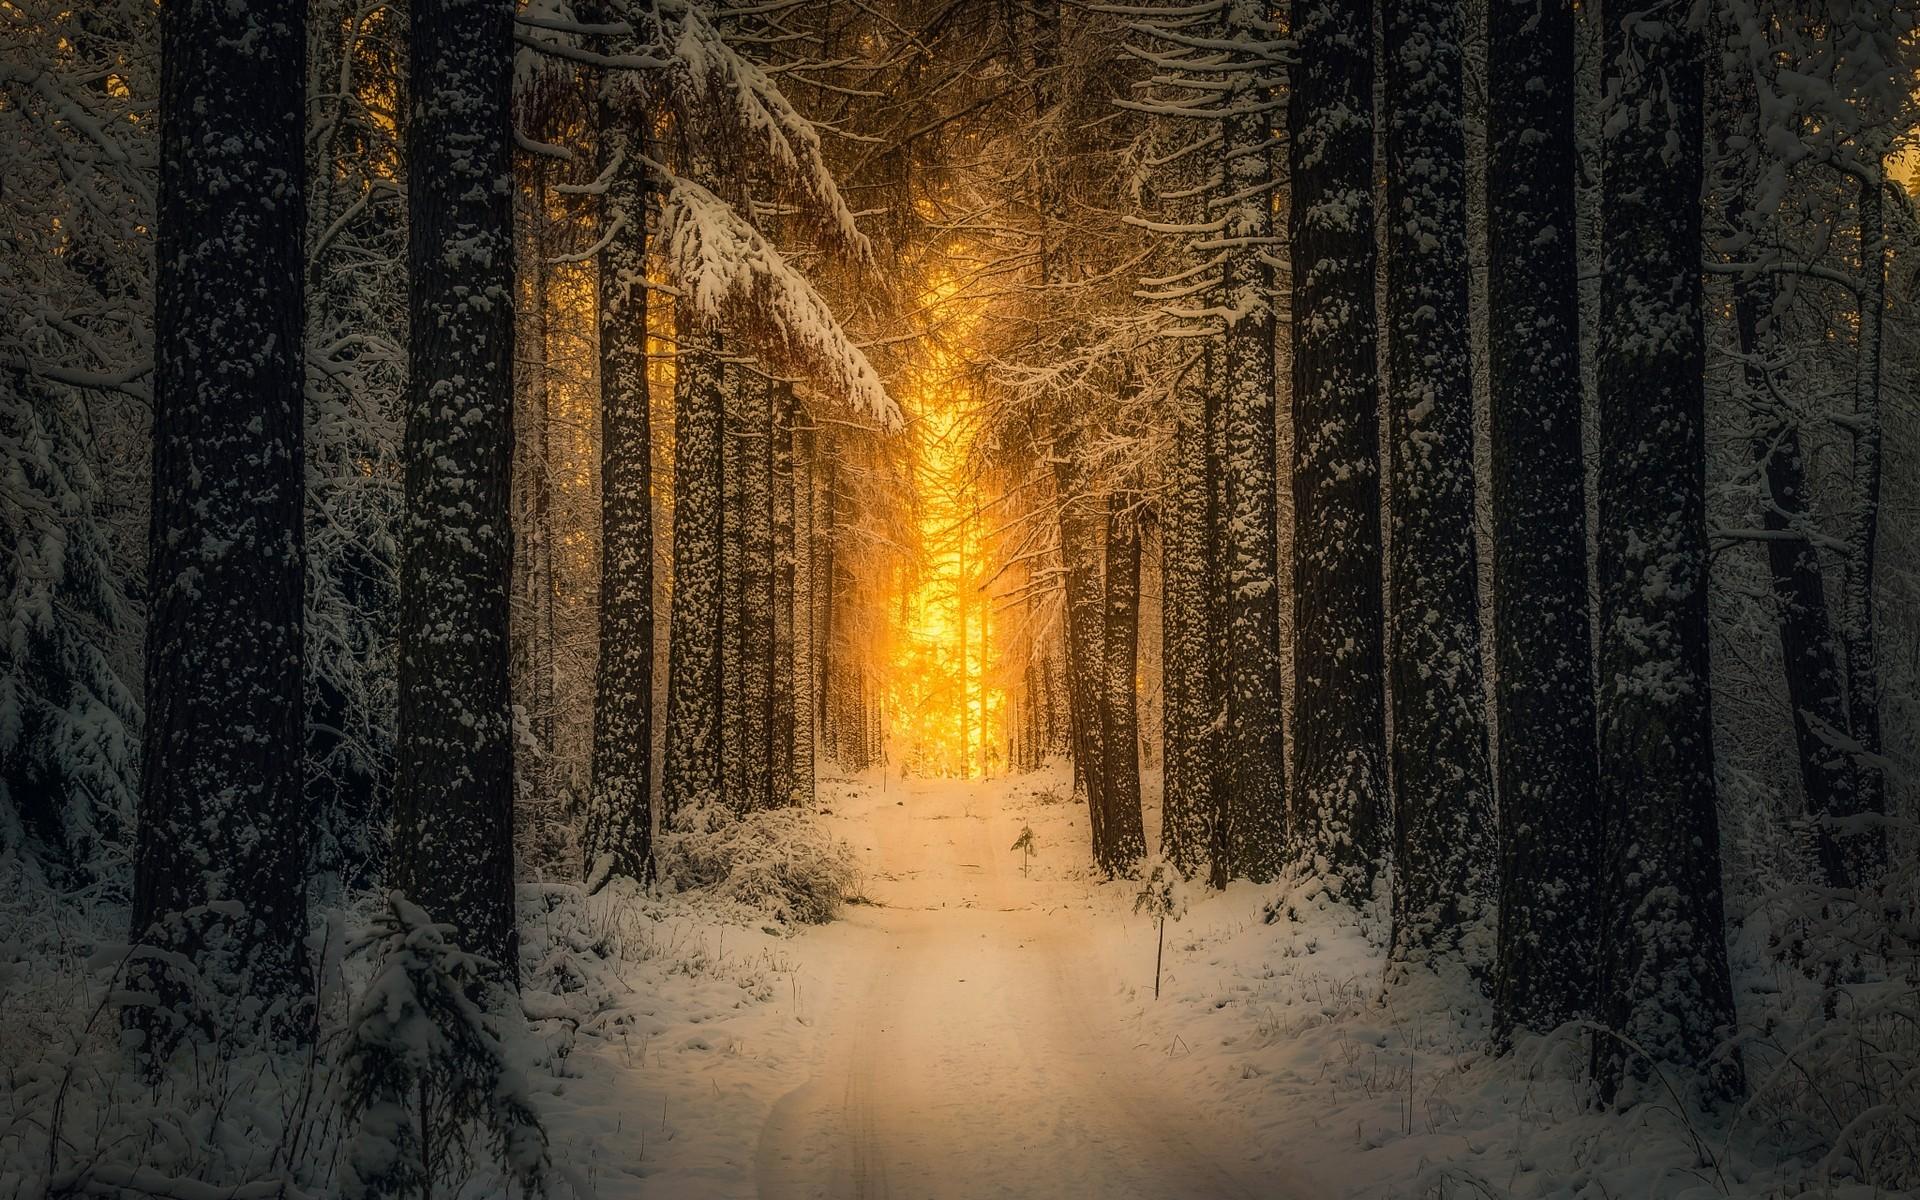 sunlight-trees-landscape-forest-nature-reflection-snow-winter-morning-path-Finland-Freezing-light-tree-weather-season-darkness-atmospheric-phenomenon-91548.jpg